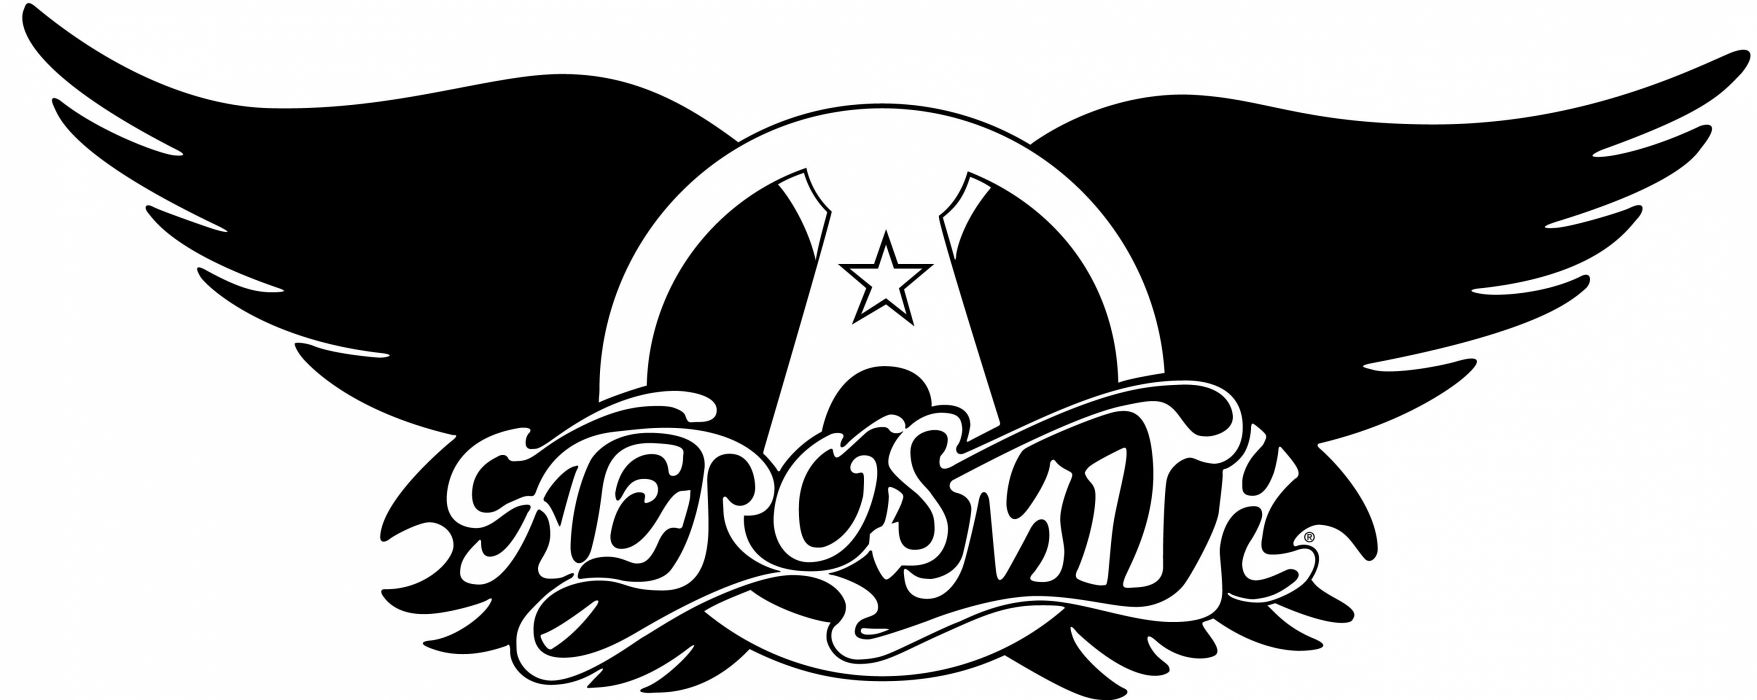 Aerosmith Hard Rock Glam Heavy Metal Glam Wallpaper 4167x1660